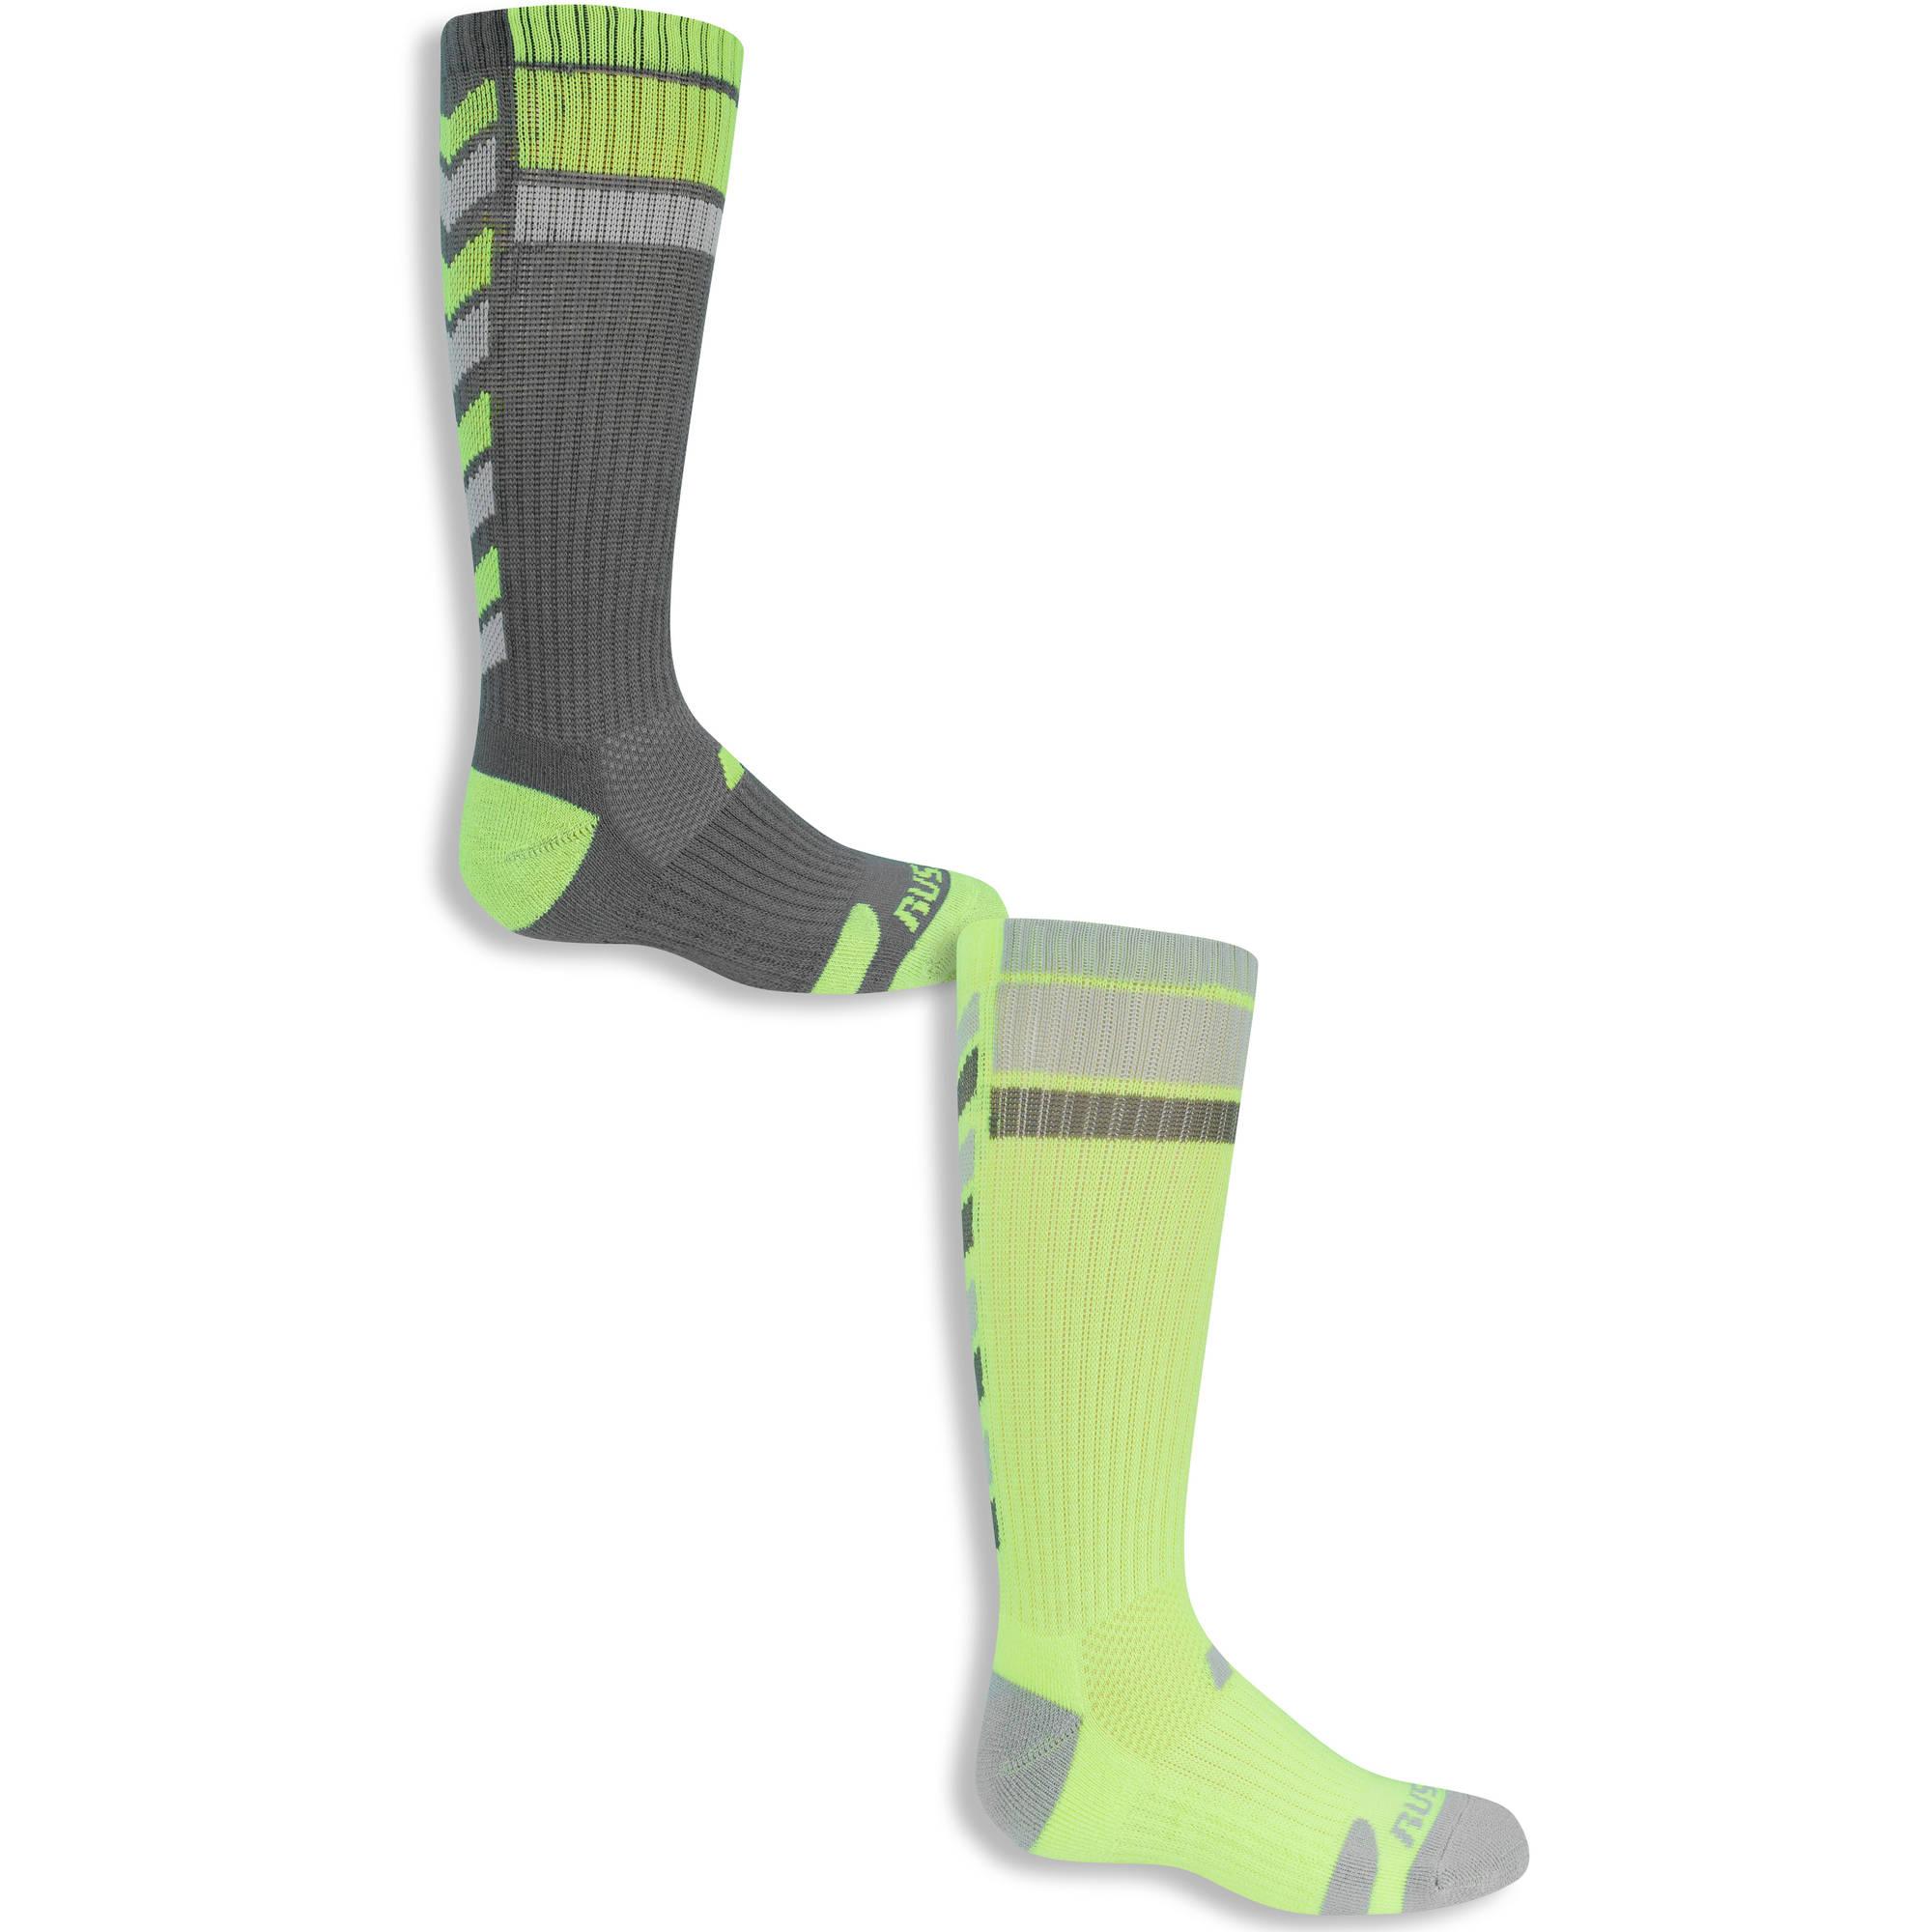 Chevron Crew Socks, 3 Pairs (Big Boys) YMMV $1.5